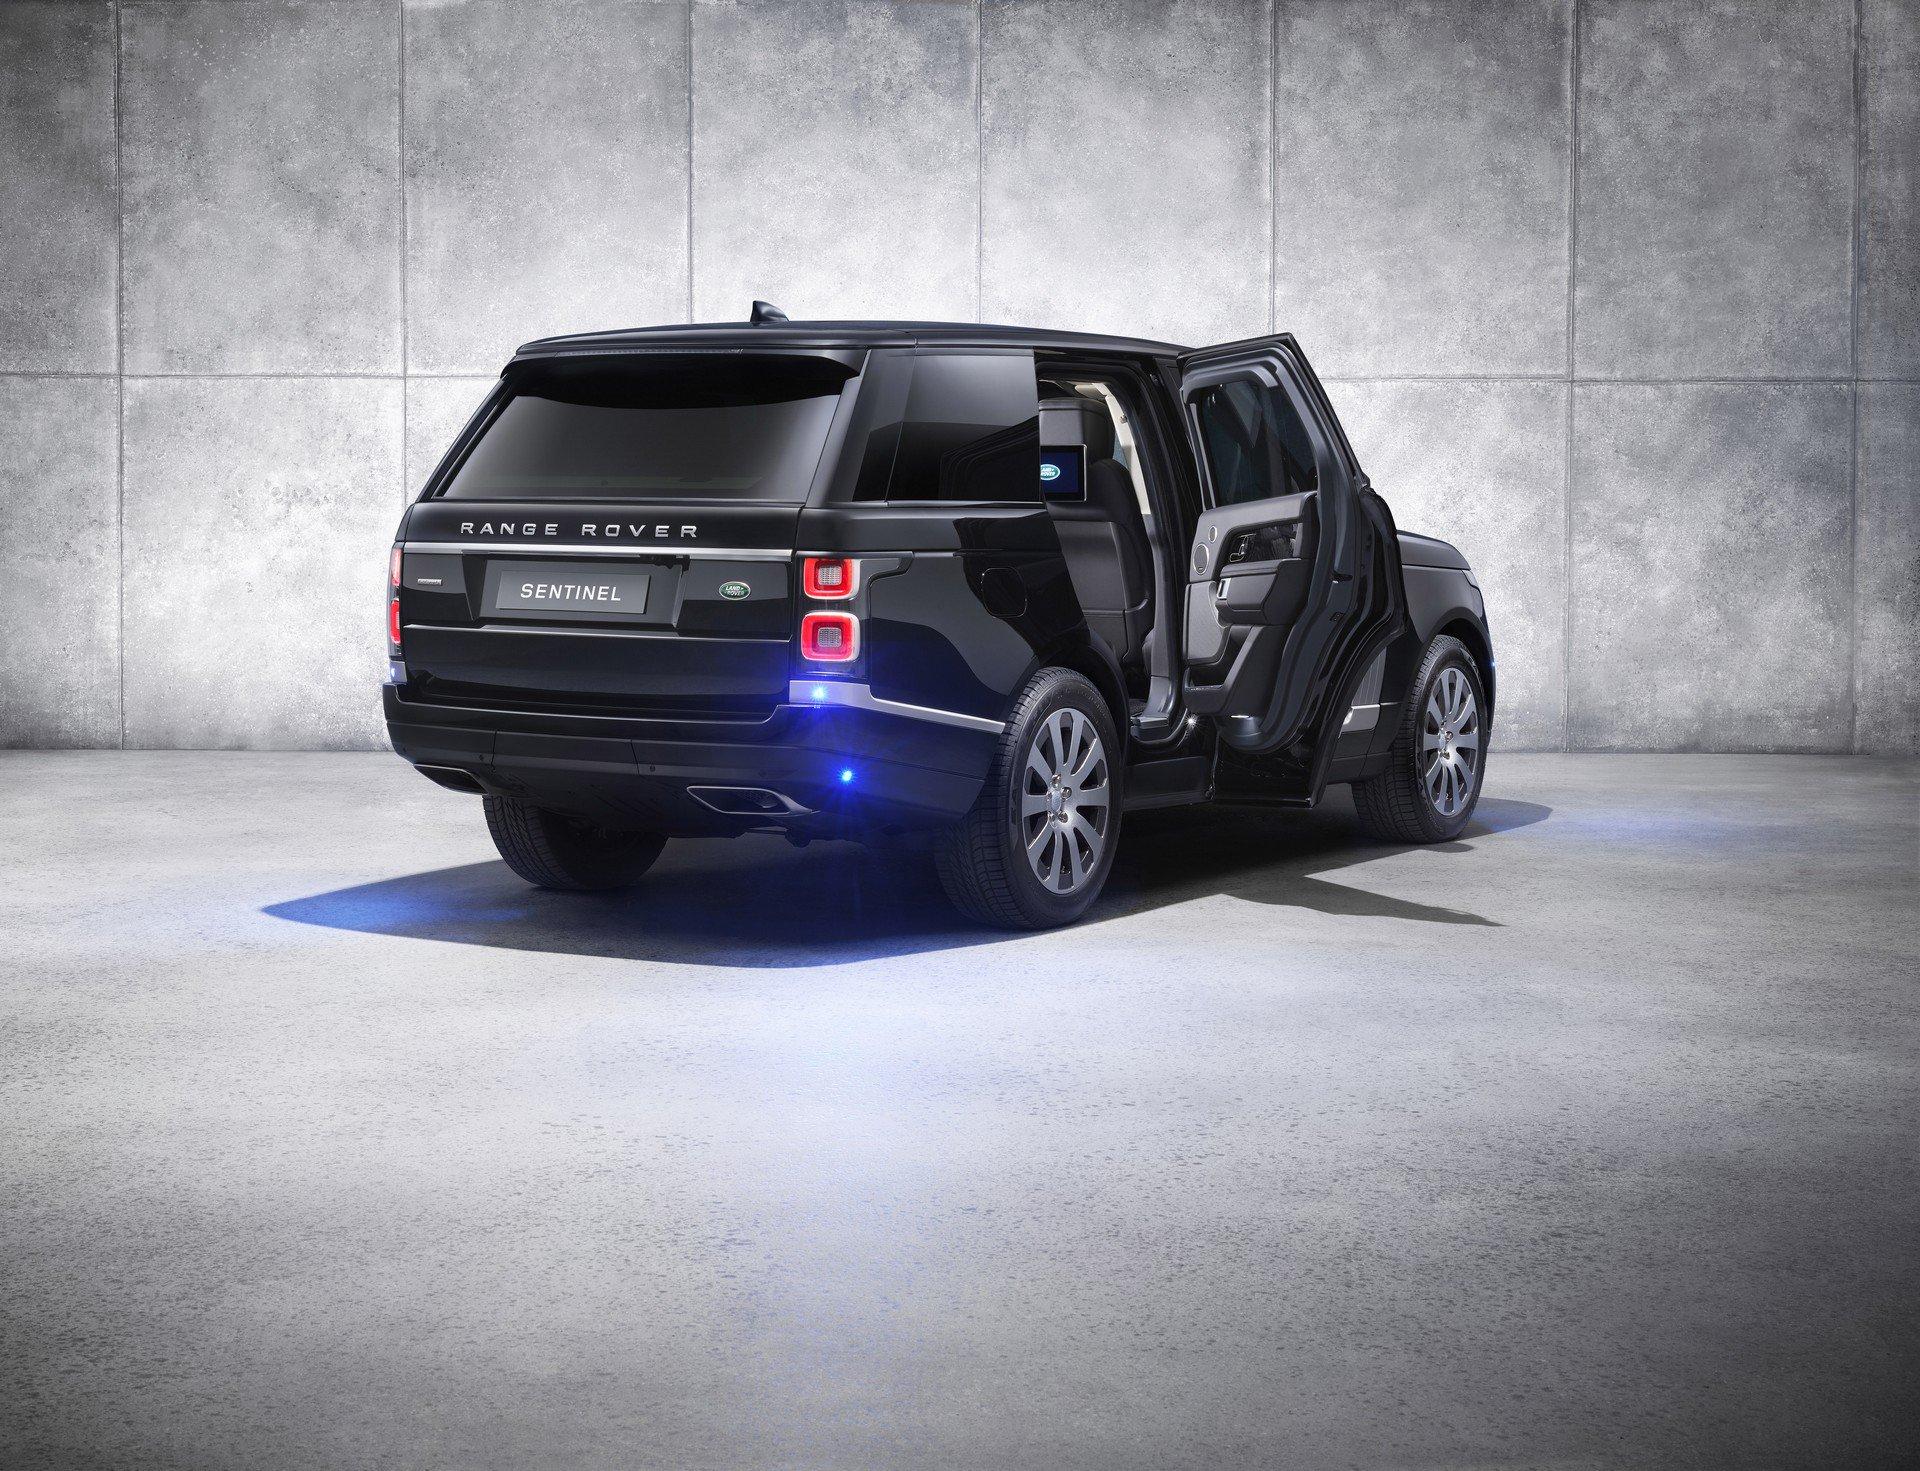 Range Rover Sentinel (11)